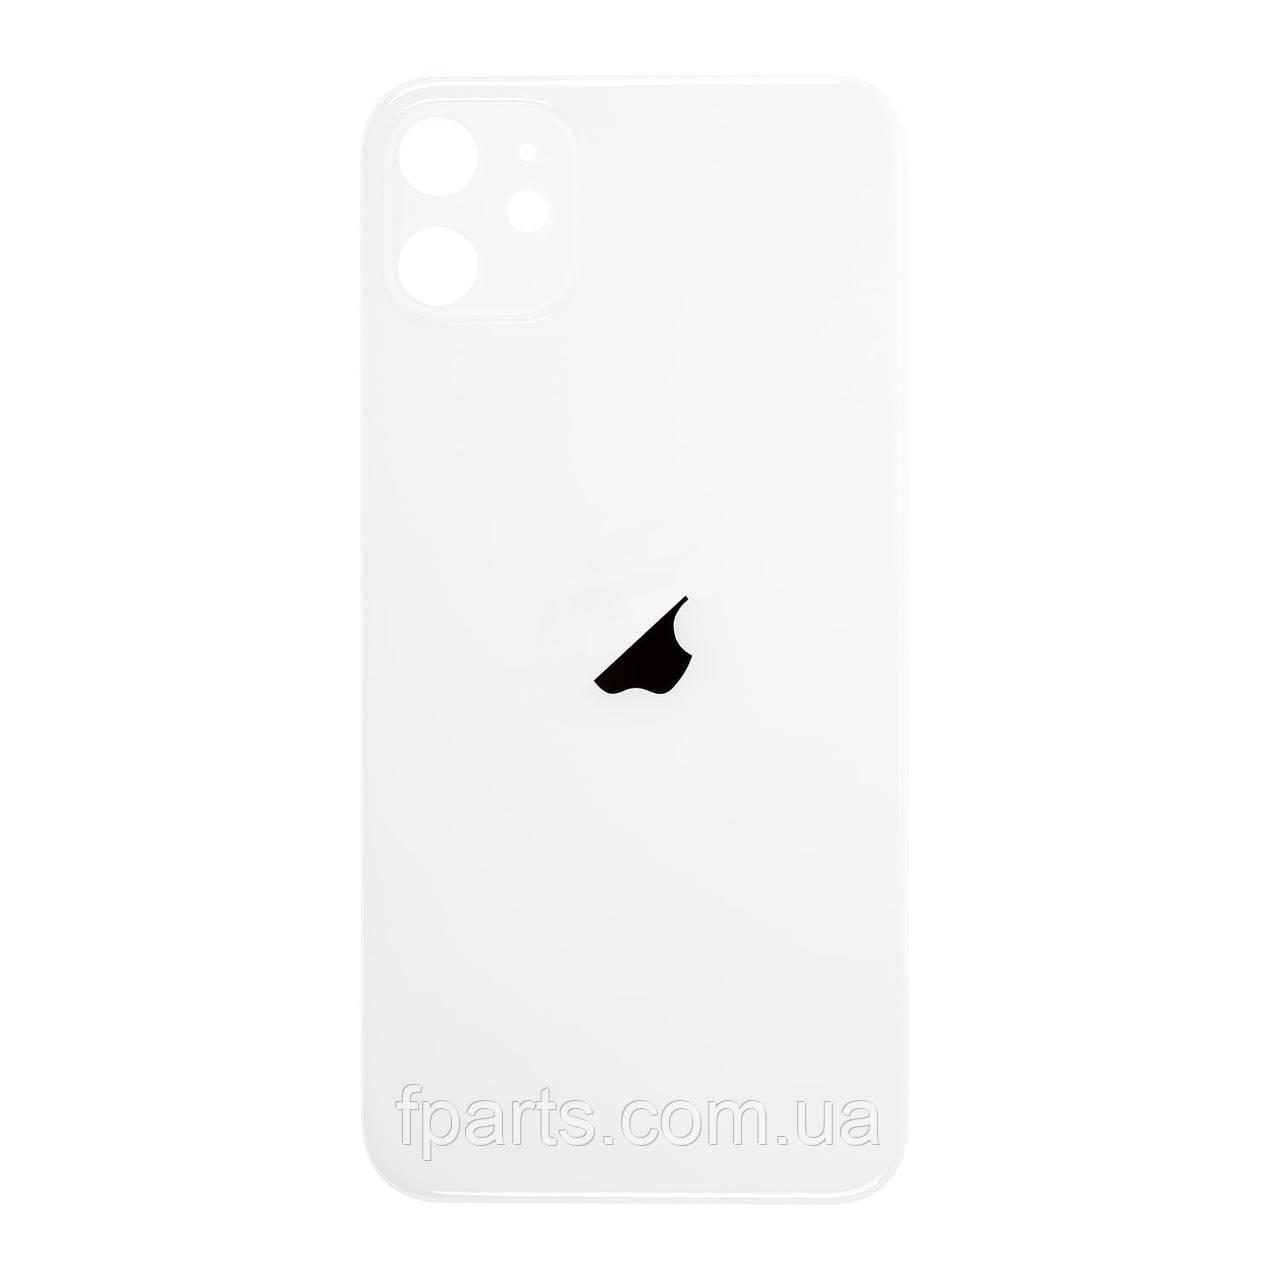 Задняя крышка iPhone 11 (большой вырез под камеру) White